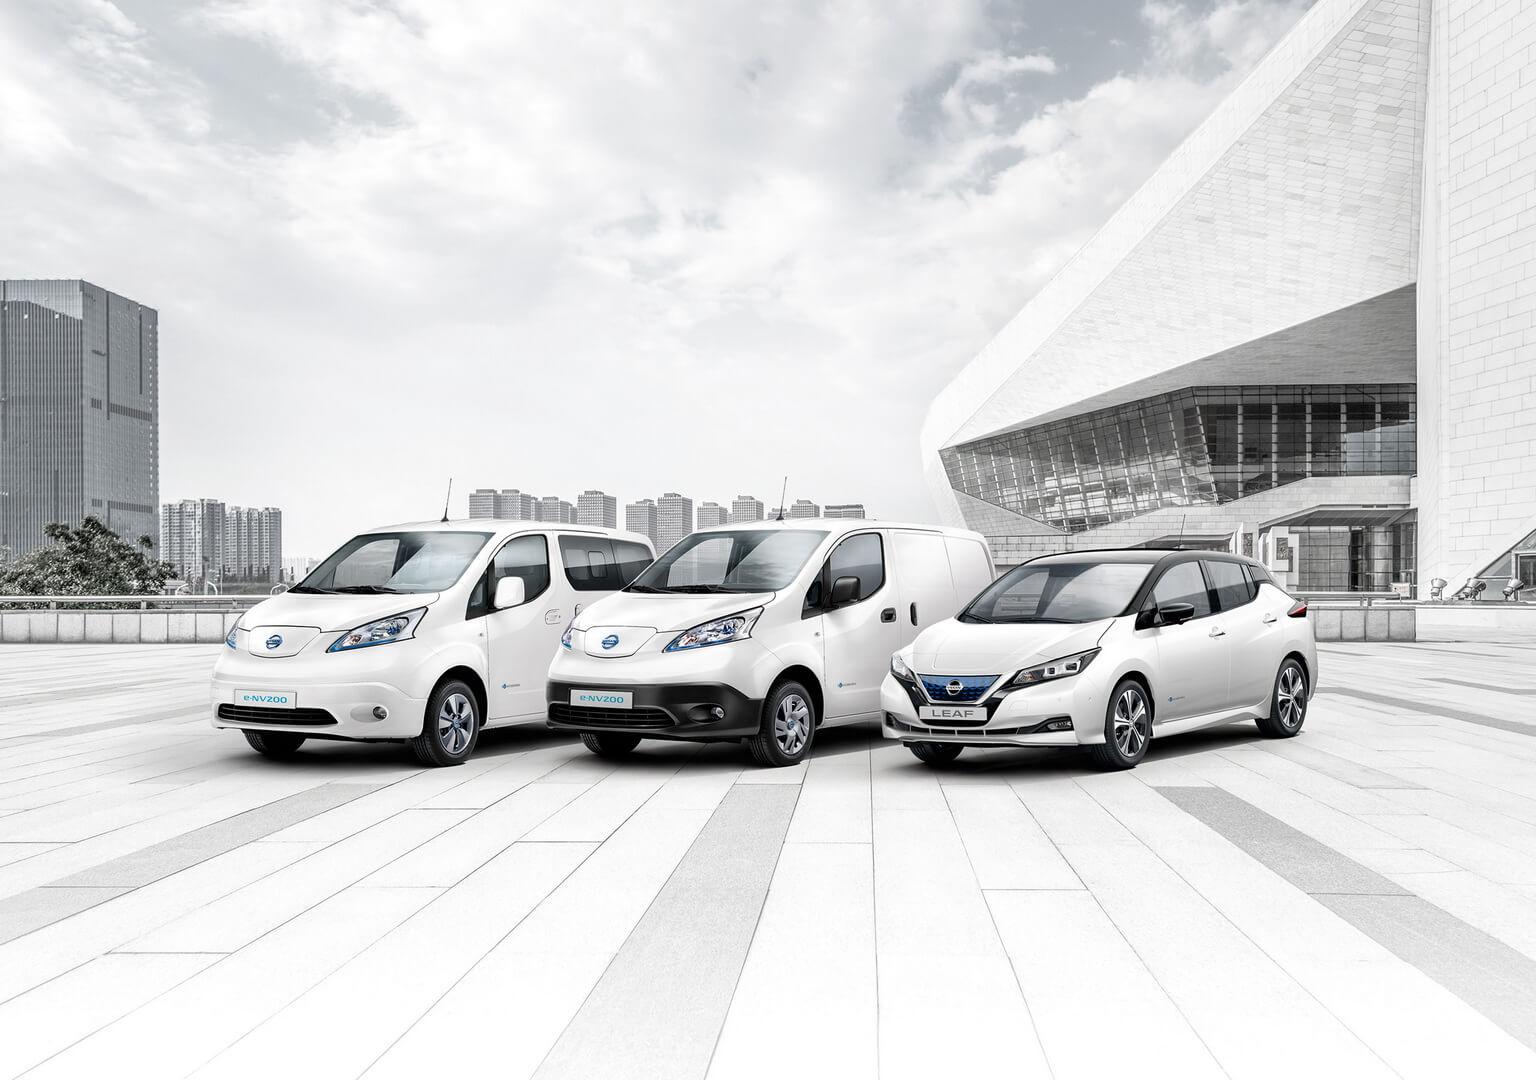 Продажи электромобилей Nissan в Европе достигли 250 000 единиц